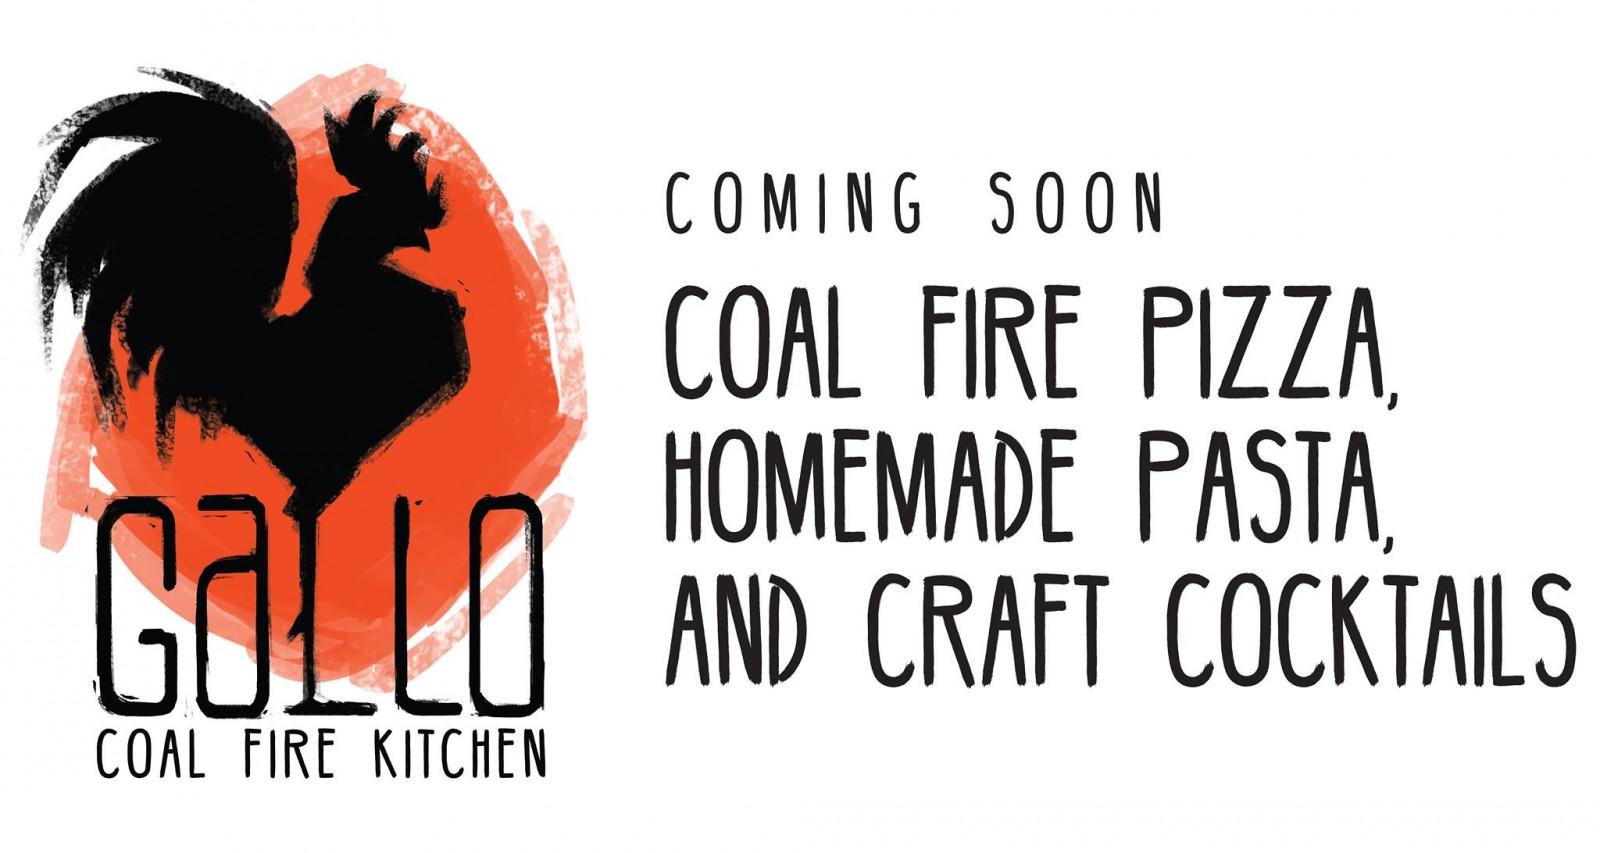 Gallo Coal Fire Kitchen is under way on Center Street in Lewiston. (Photo: Gallo Facebook)